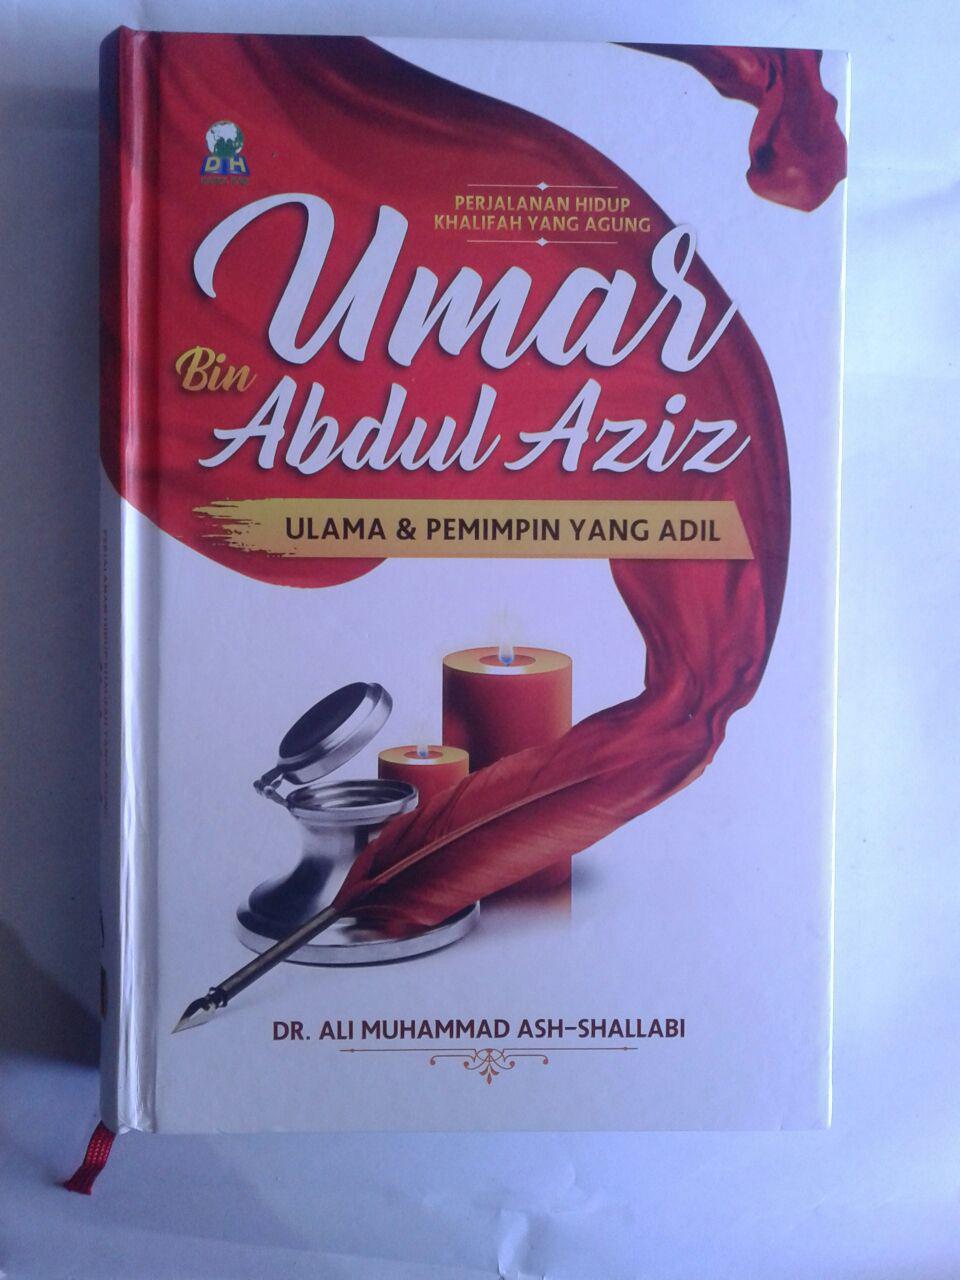 Buku Perjalanan Hidup Khalifah Yang Agung Umar Bin Abdul Aziz Ulama Dan Pemimpin Yang Adil cover 2